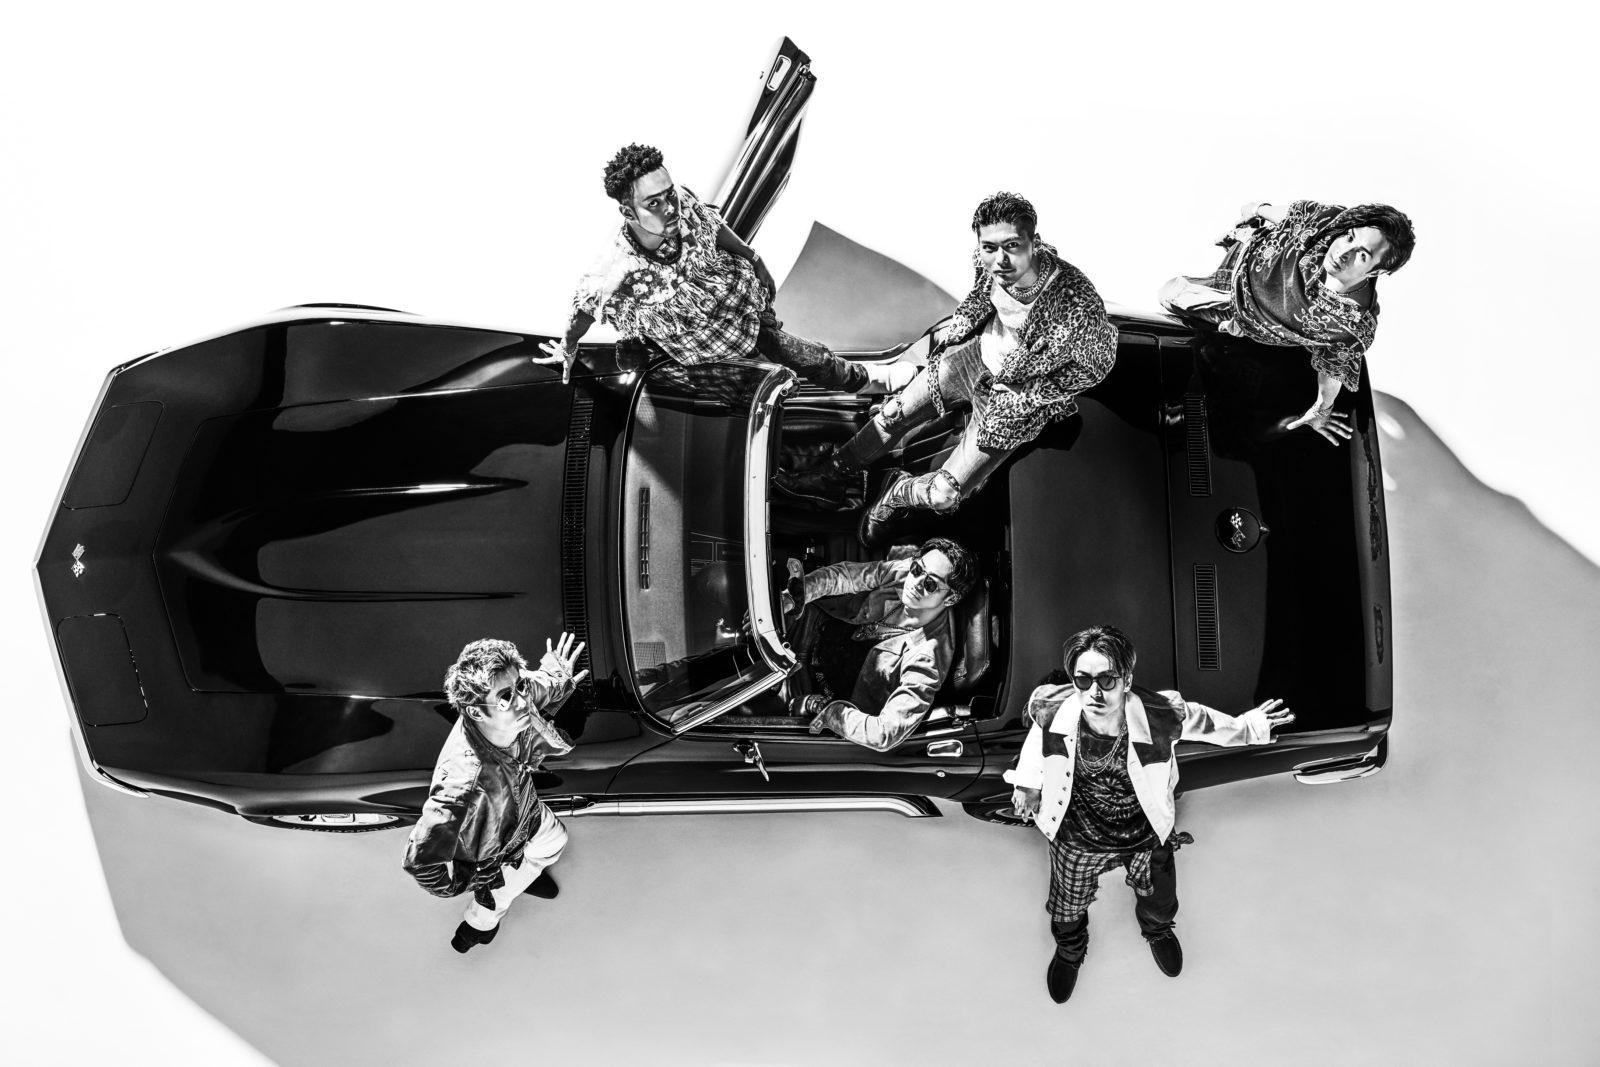 EXILE THE SECOND、世界的映像ディレクター・Dave Meyers(デーブ・メイヤーズ)が手掛けた、全編LA撮影によるミュージック・ビデオが解禁サムネイル画像